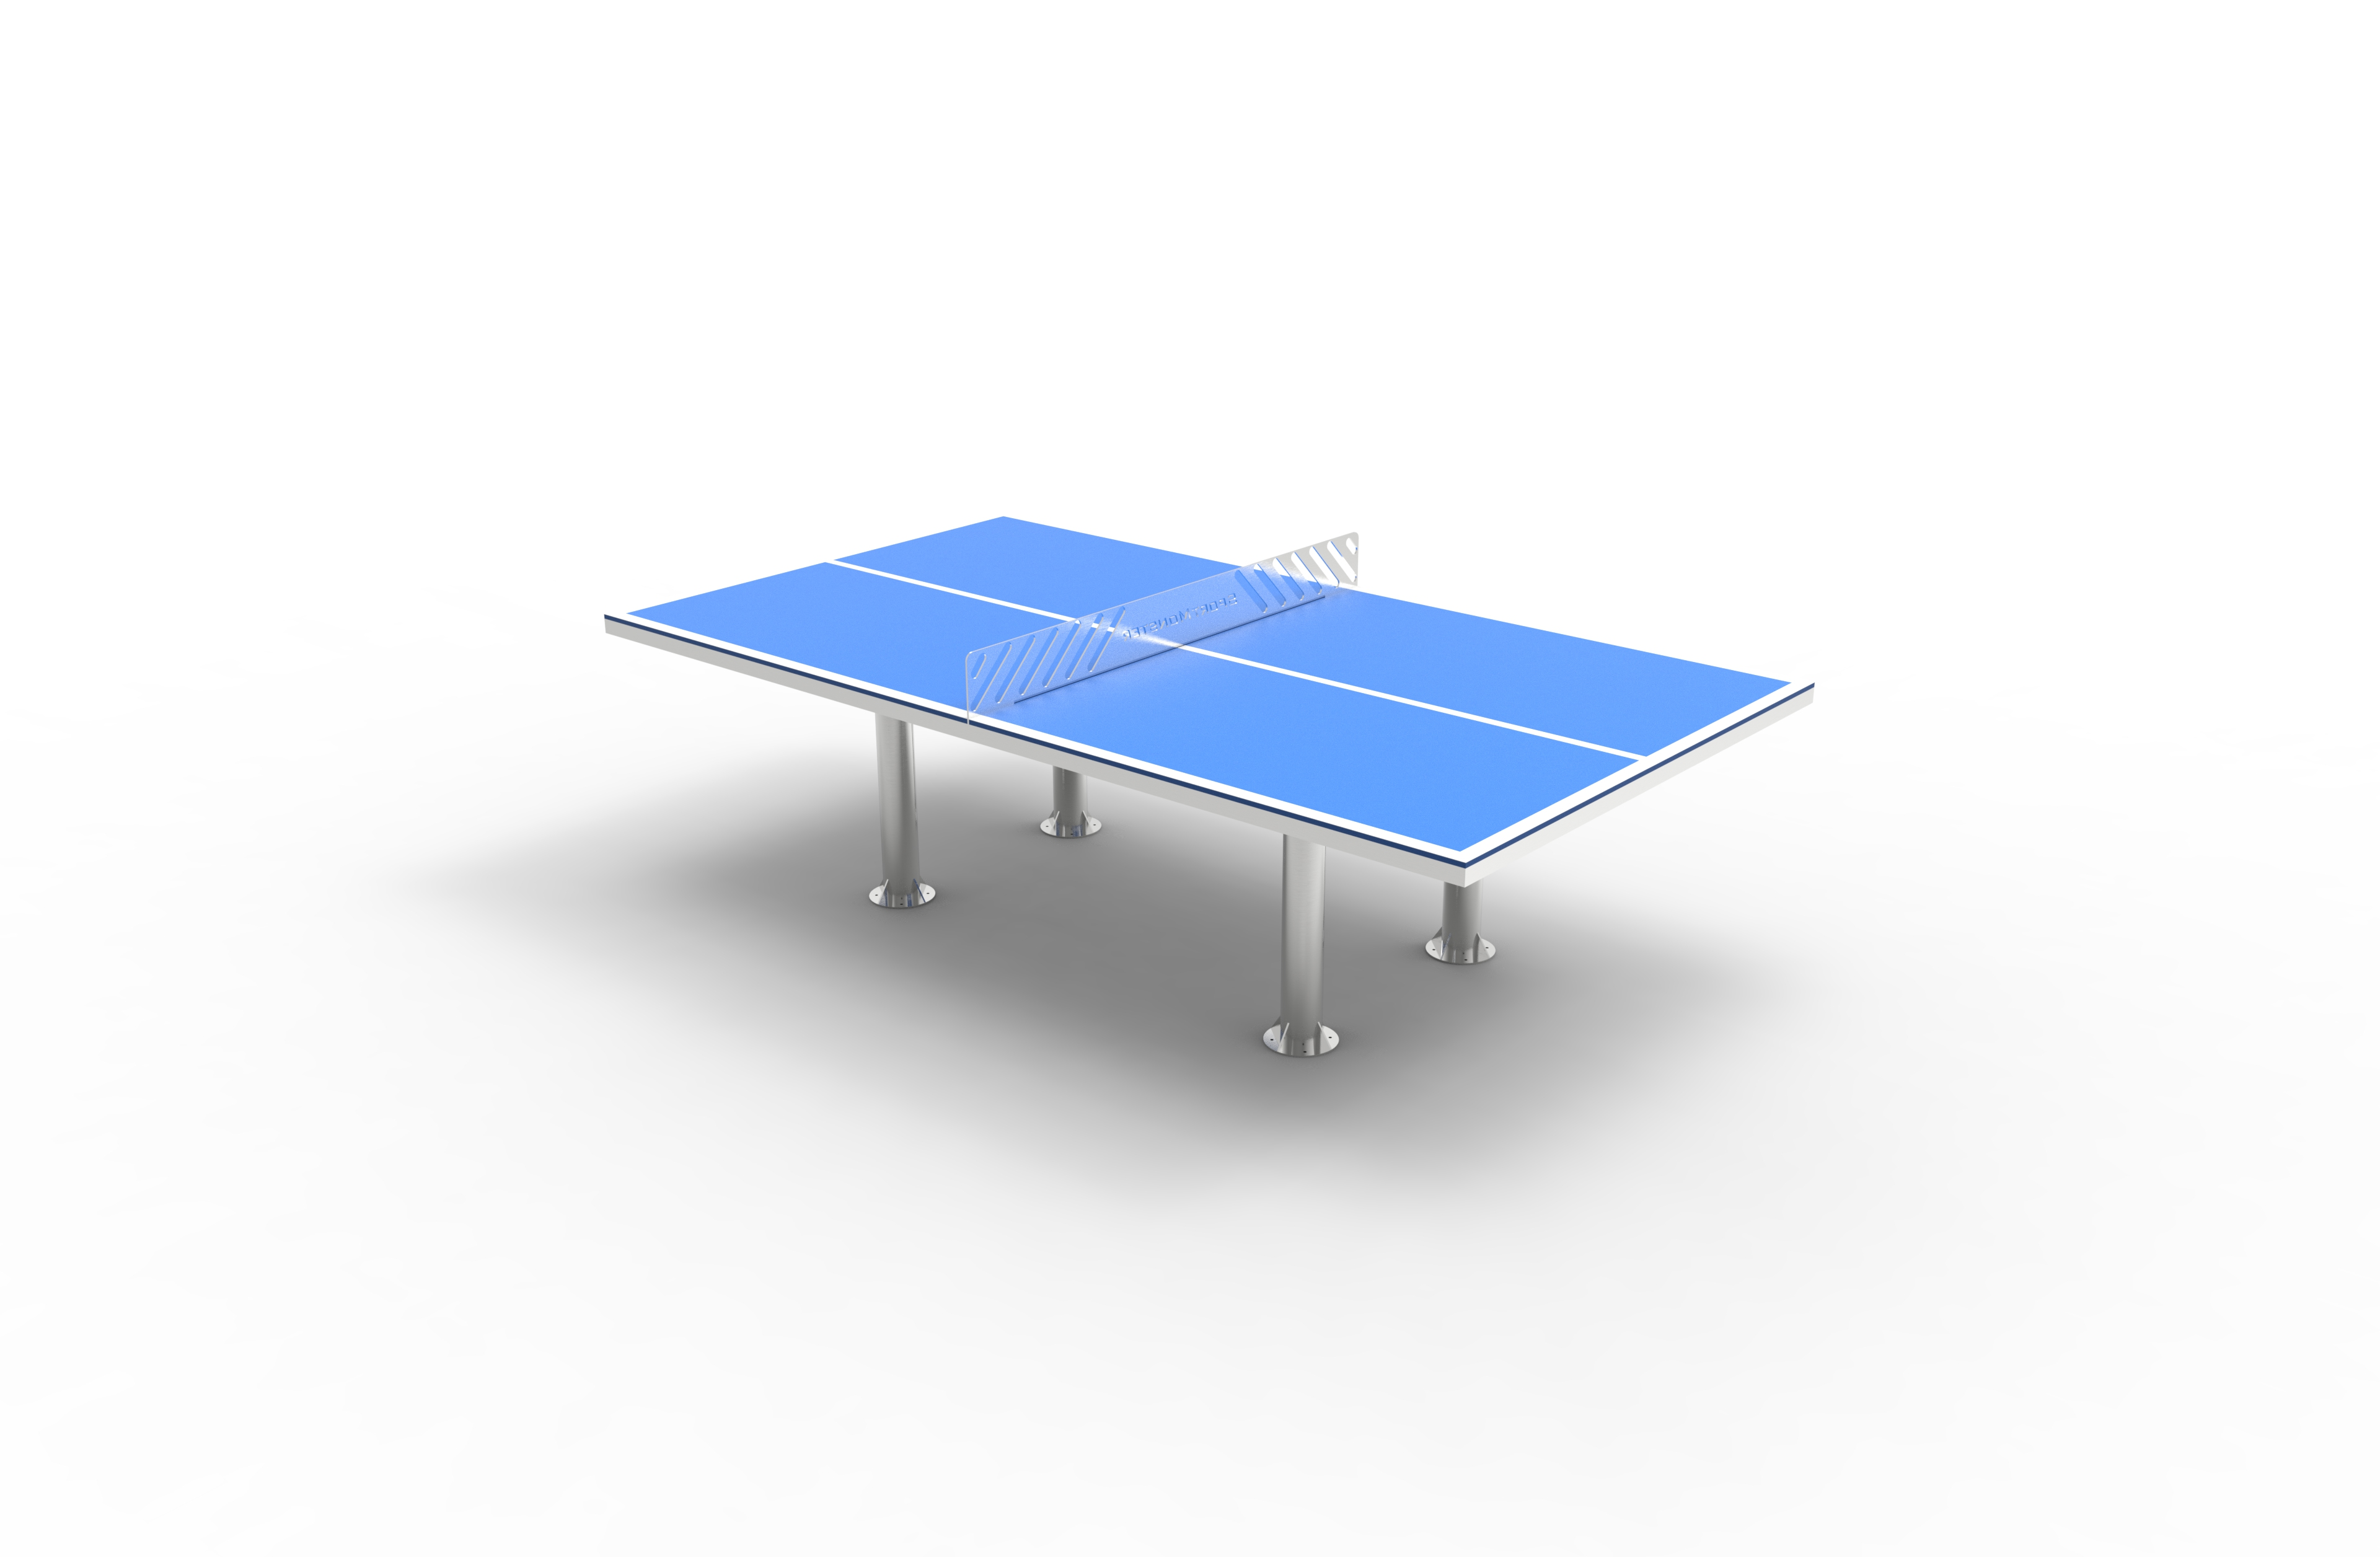 Tavolo ping pong easy sport monster - Dimensioni tavolo ping pong ...